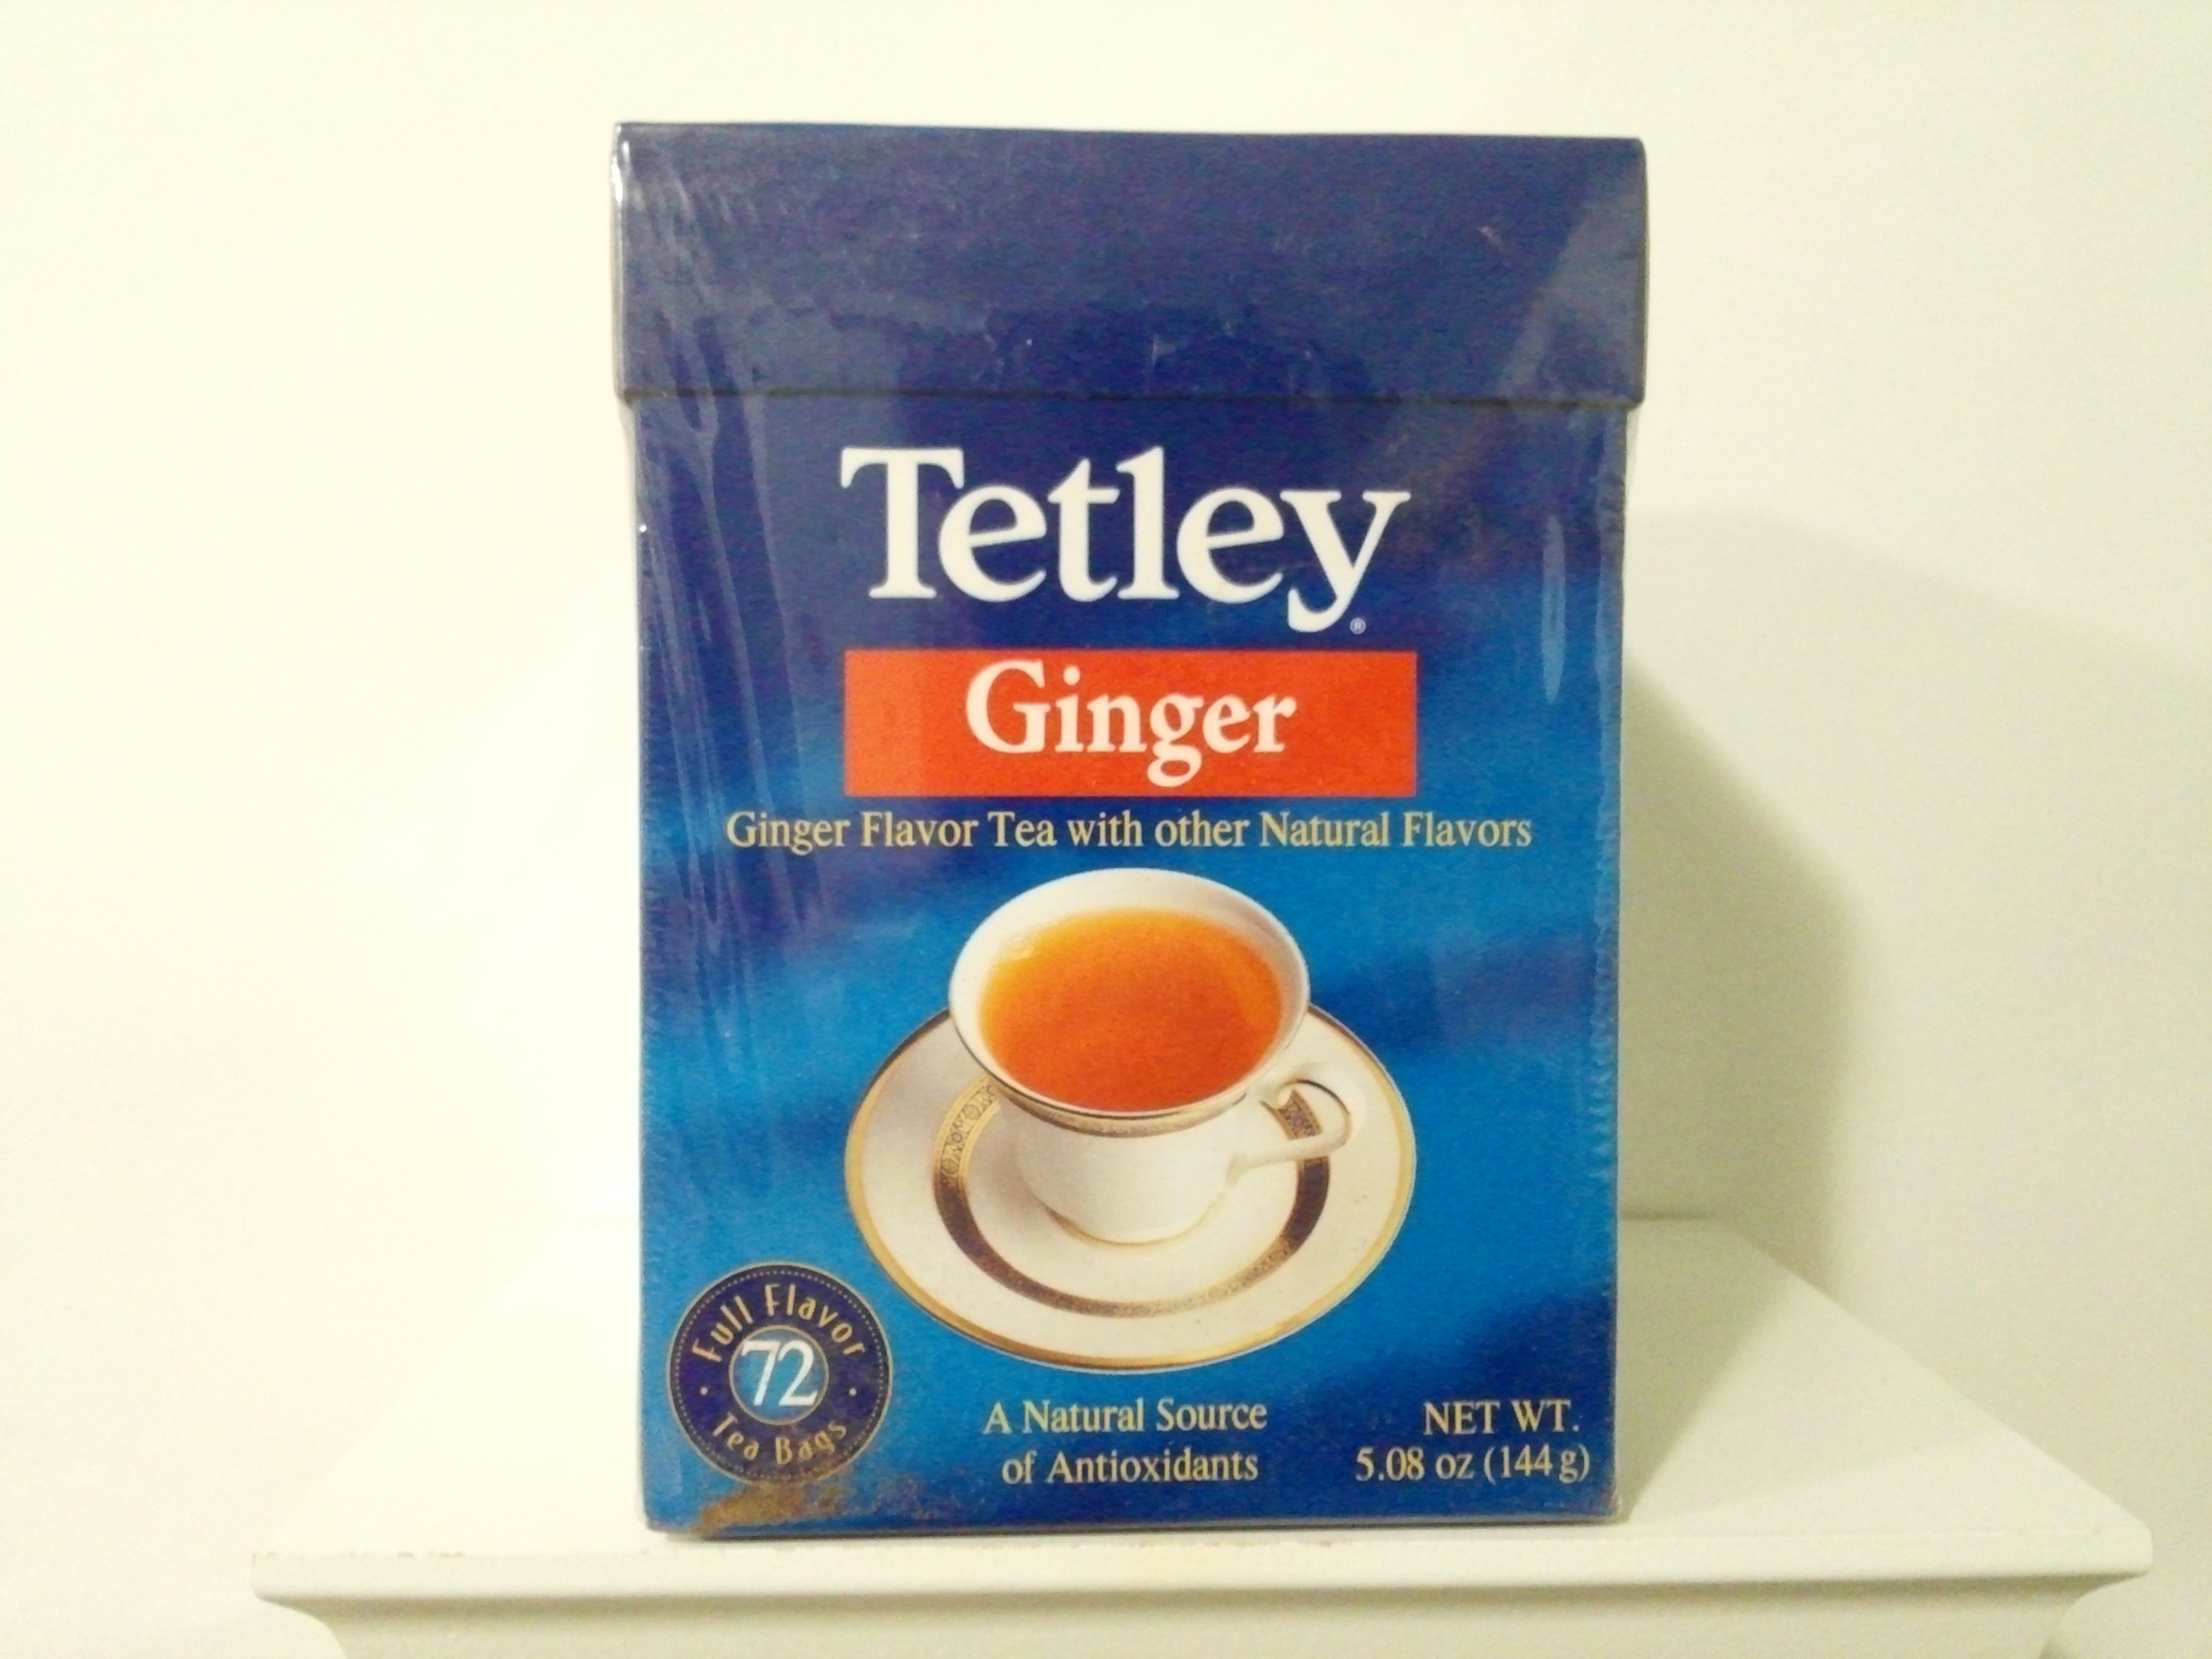 Tetley Ginger Flavour Tea 72 Bags